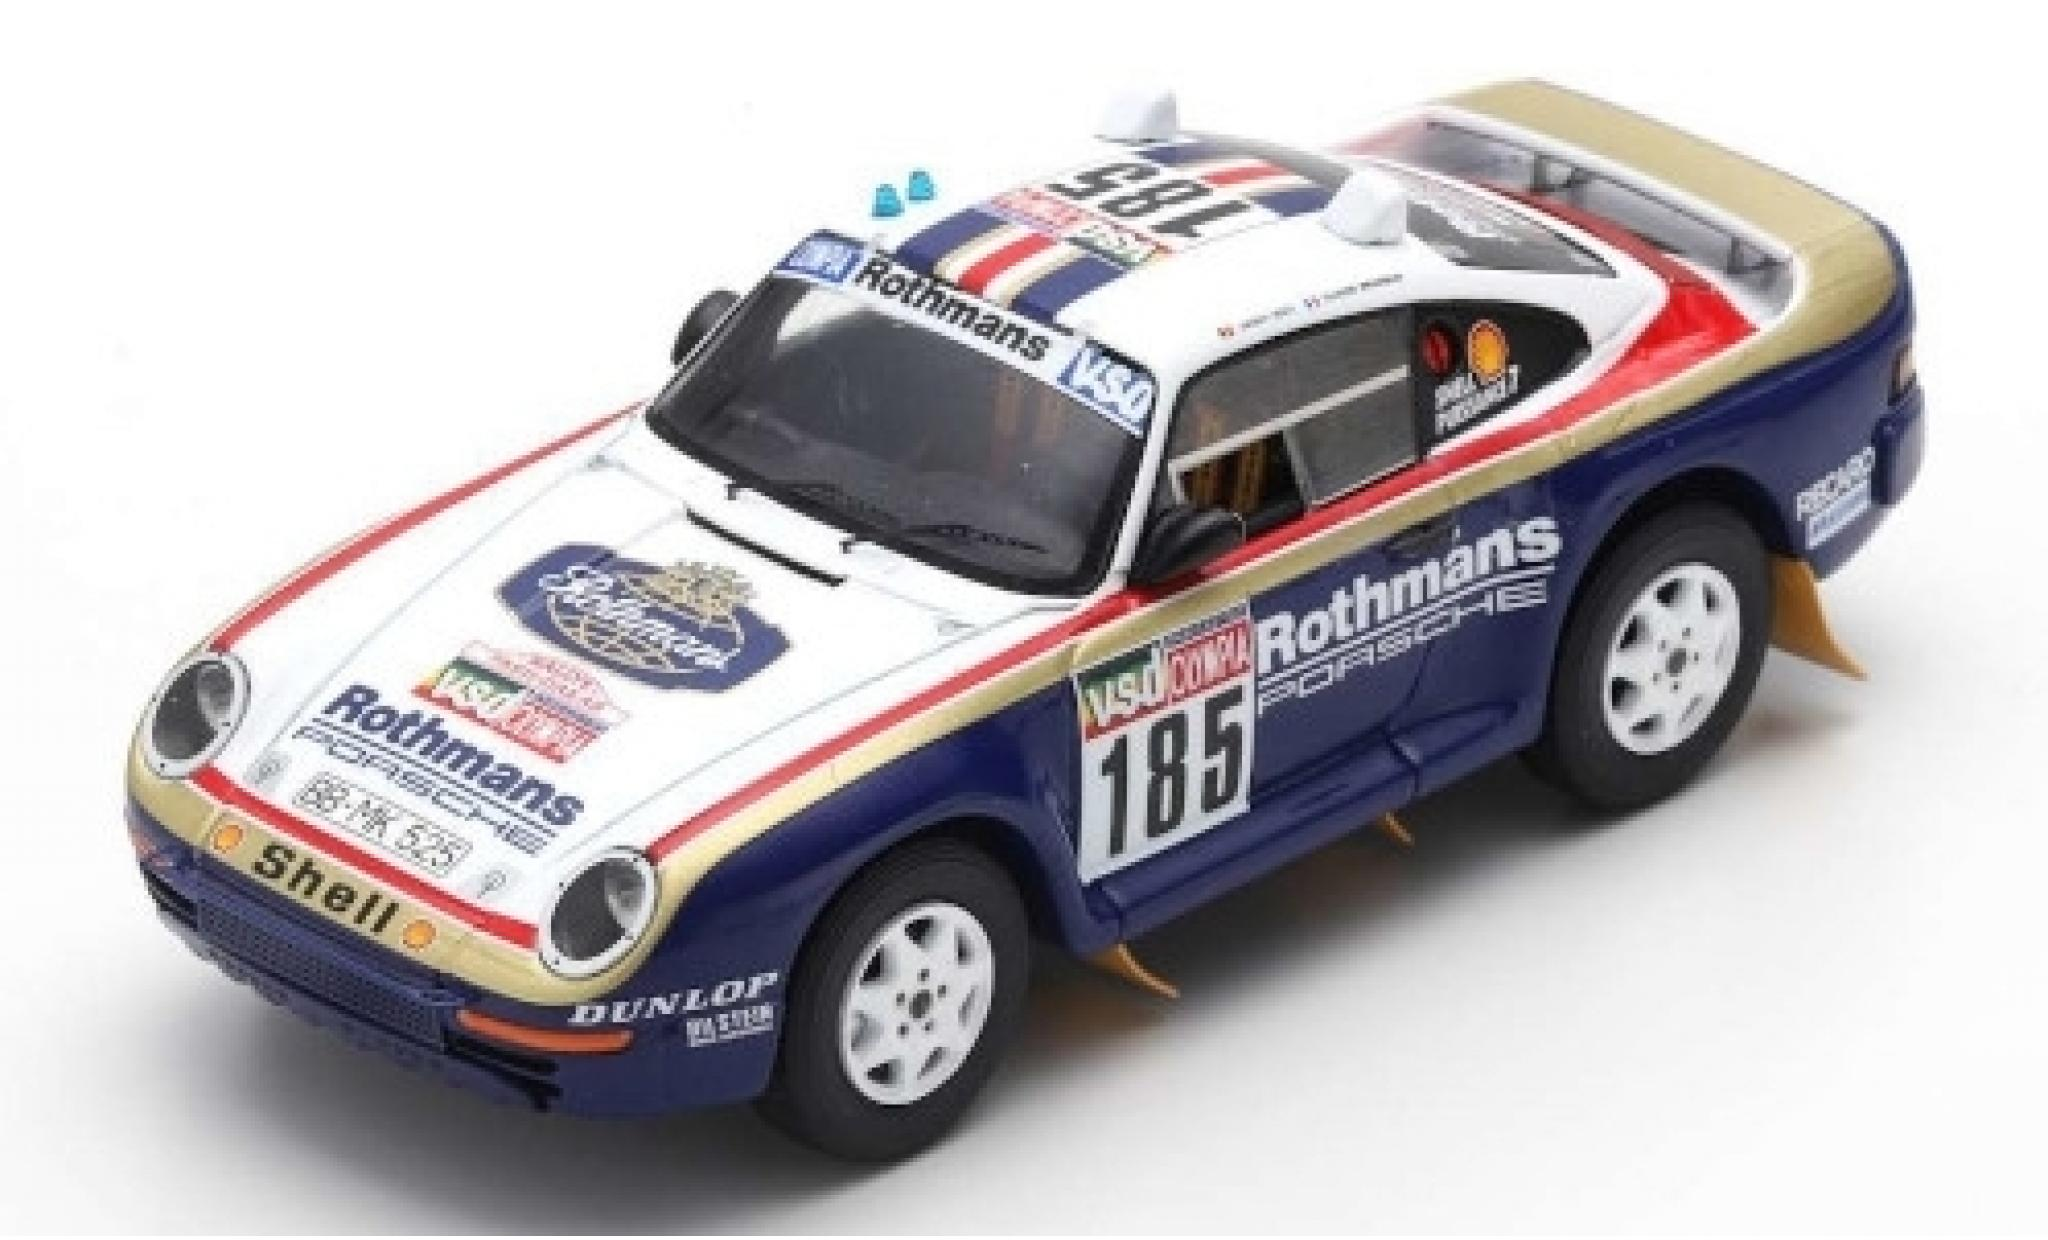 Porsche 959 1/43 Spark No.185 Rothmans Rallye Paris Dakar 1985 avec Decals J.Ickx/C.Brasseur